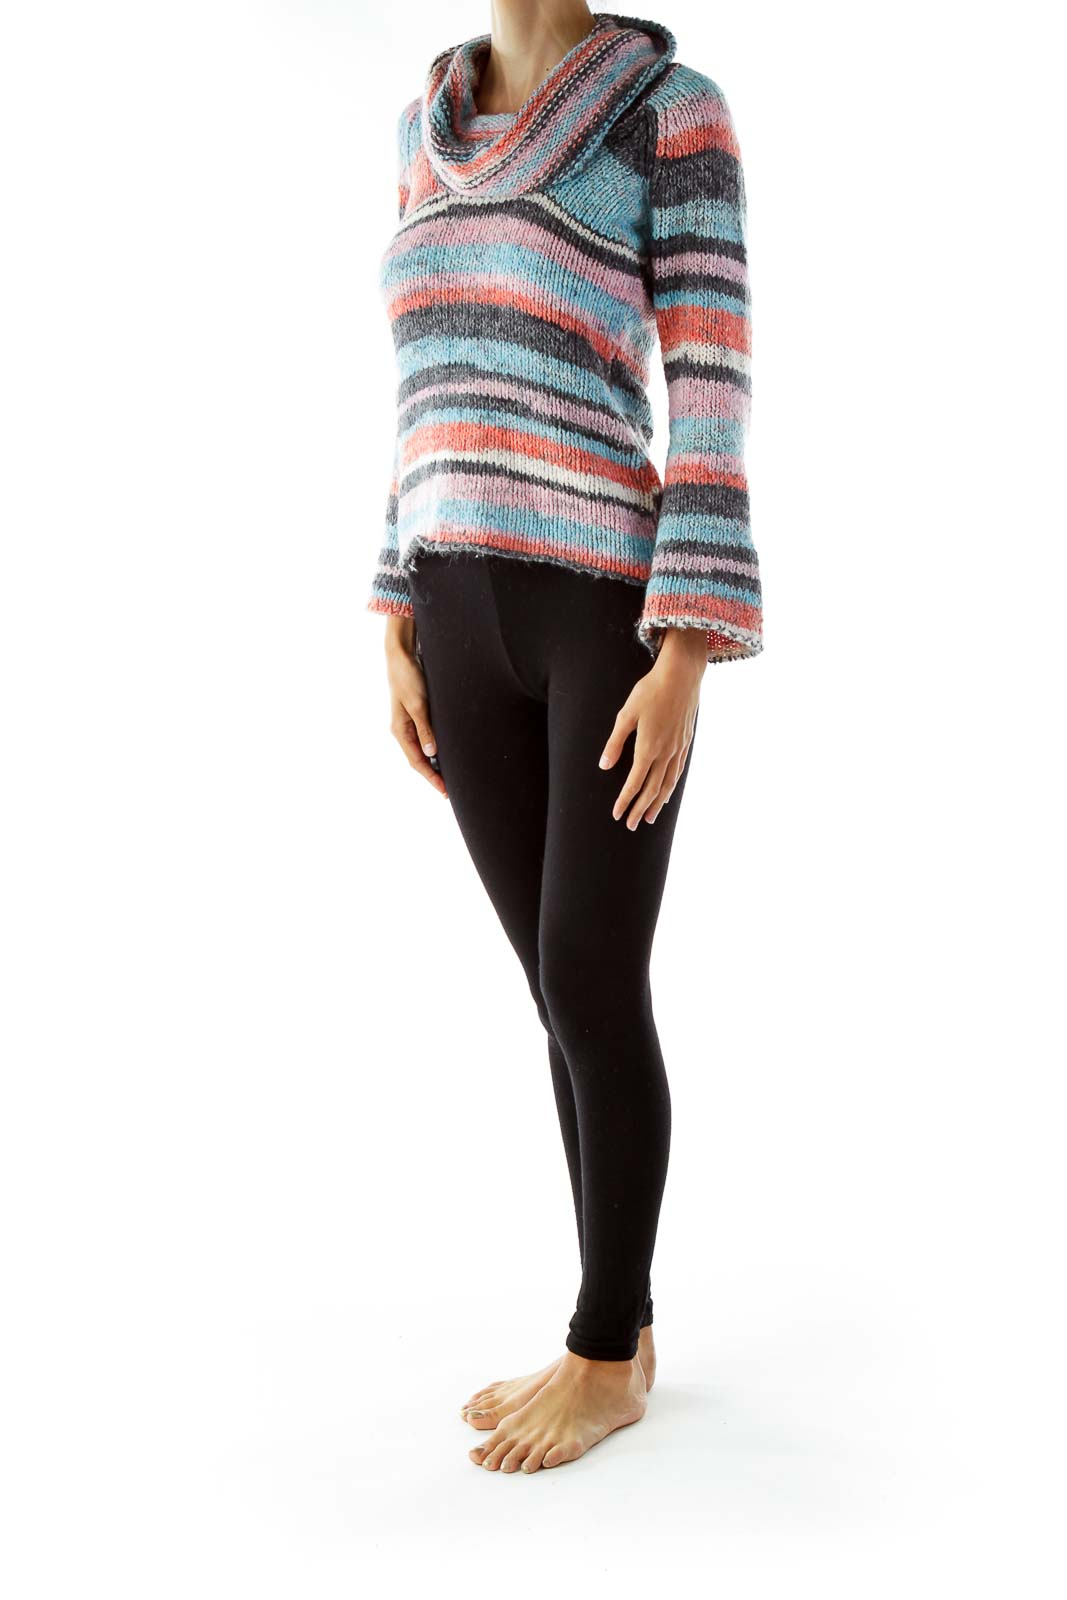 Multicolored Cowl Neck Knit Sweater